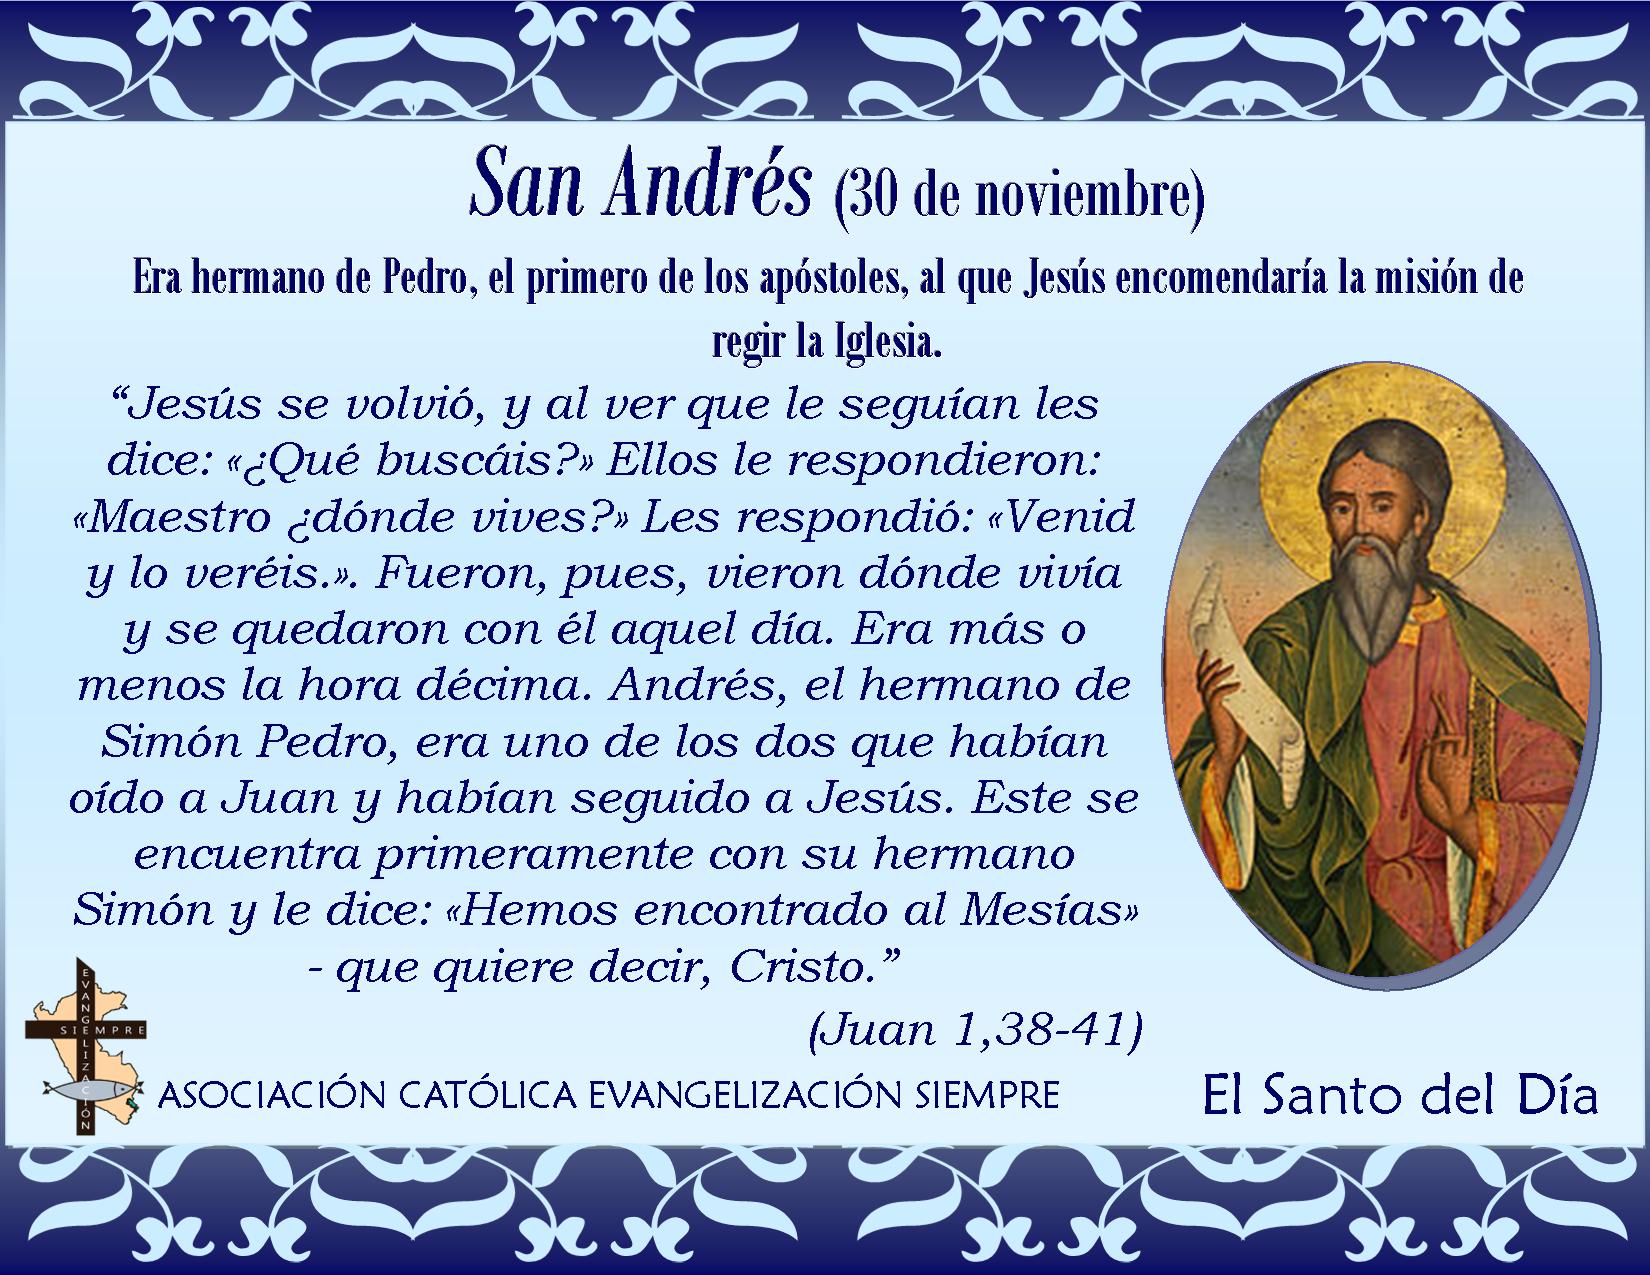 santo-del-dia-30-noviembre